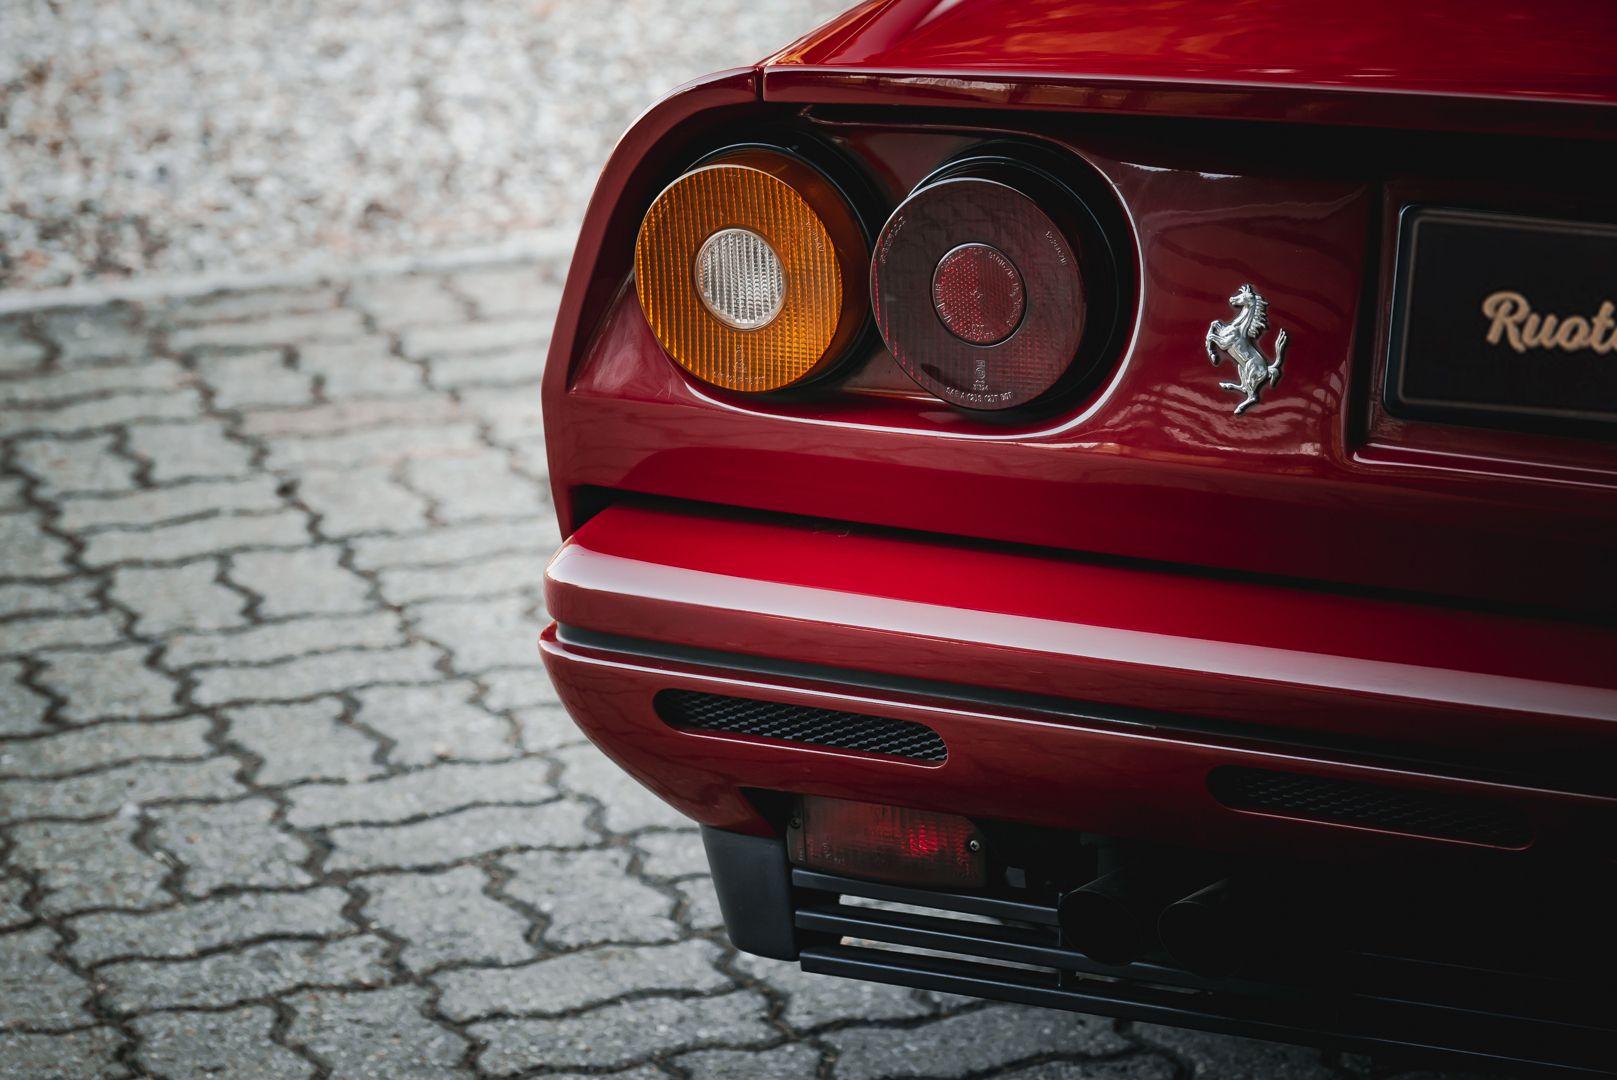 1988 FERRARI 208 GTS TURBO INTERCOOLER 75384